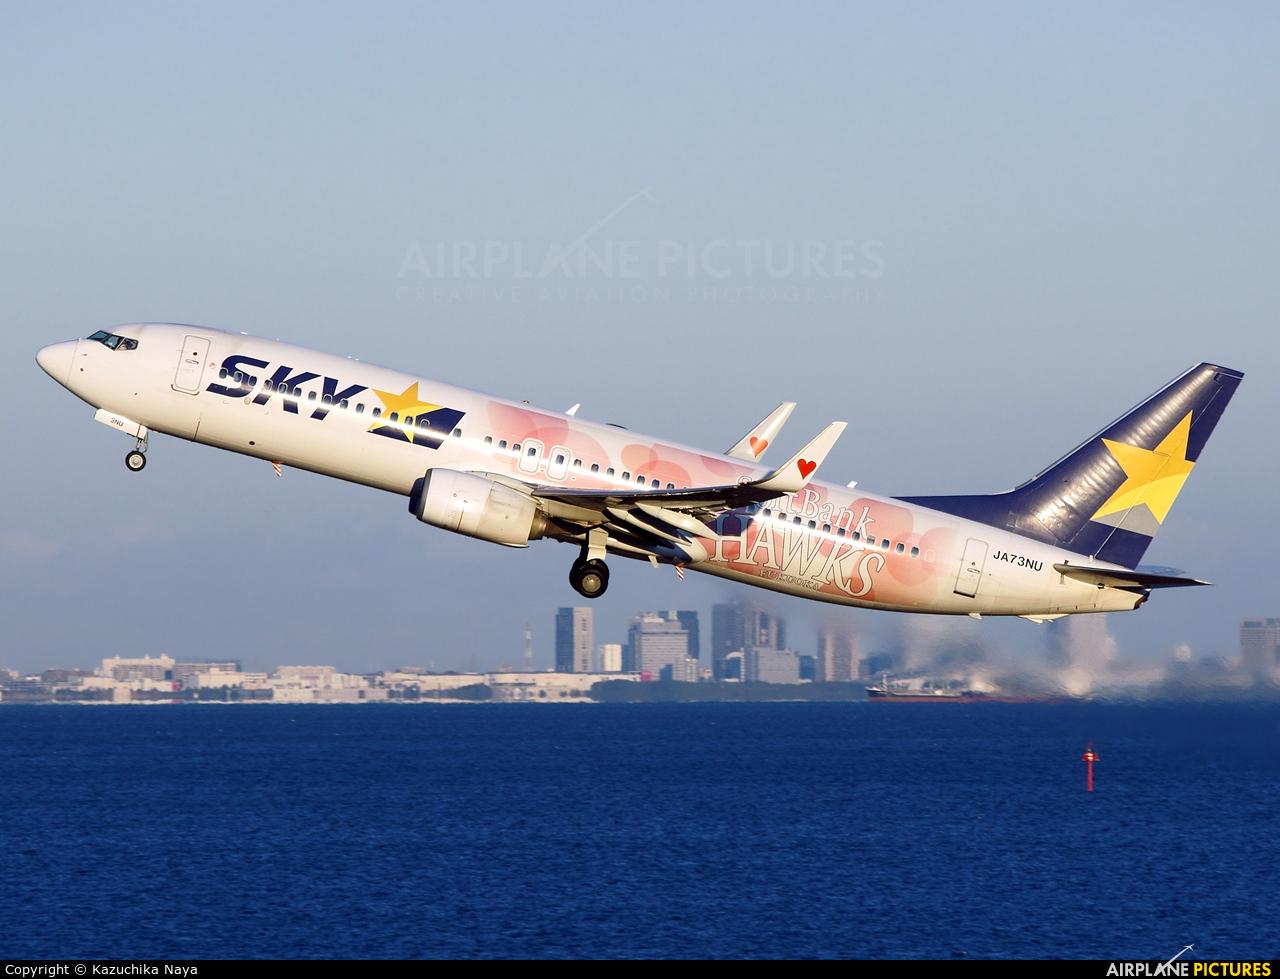 Skymark Airlines JA73NU aircraft at Tokyo - Haneda Intl